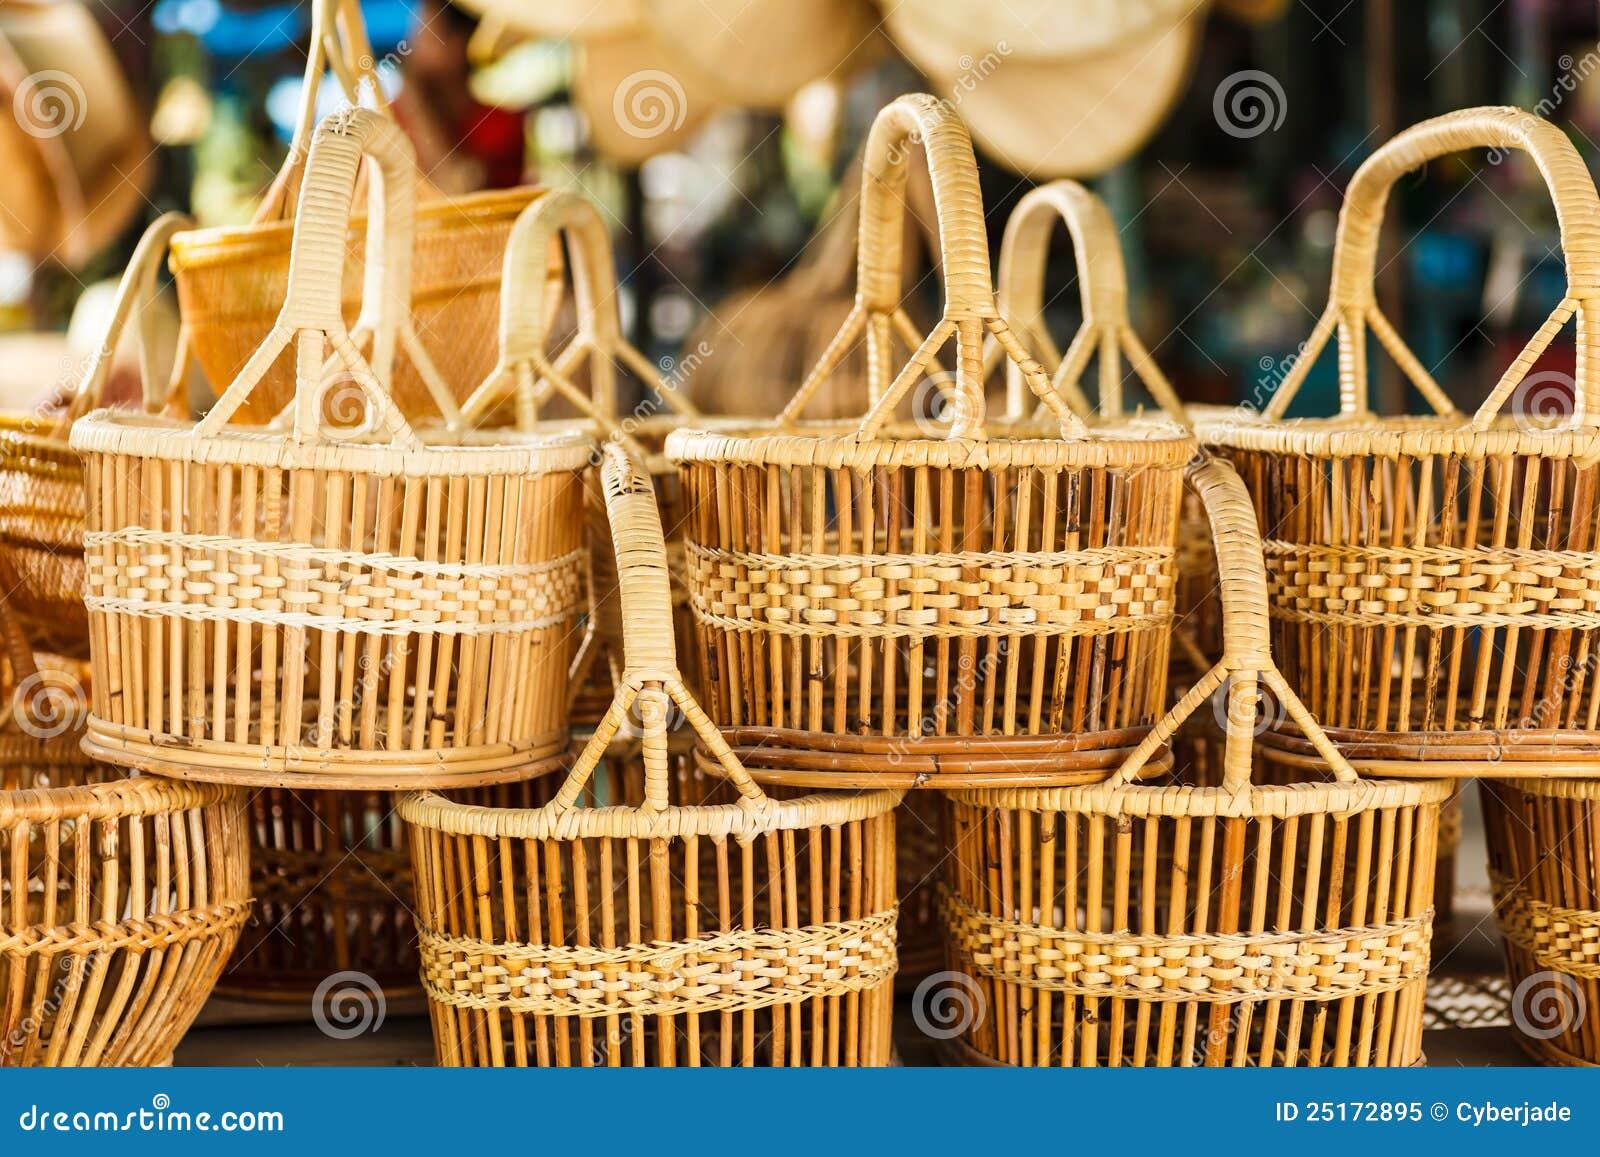 Thailand handmade baskets : Basket wicker is thai handmade royalty free stock photo